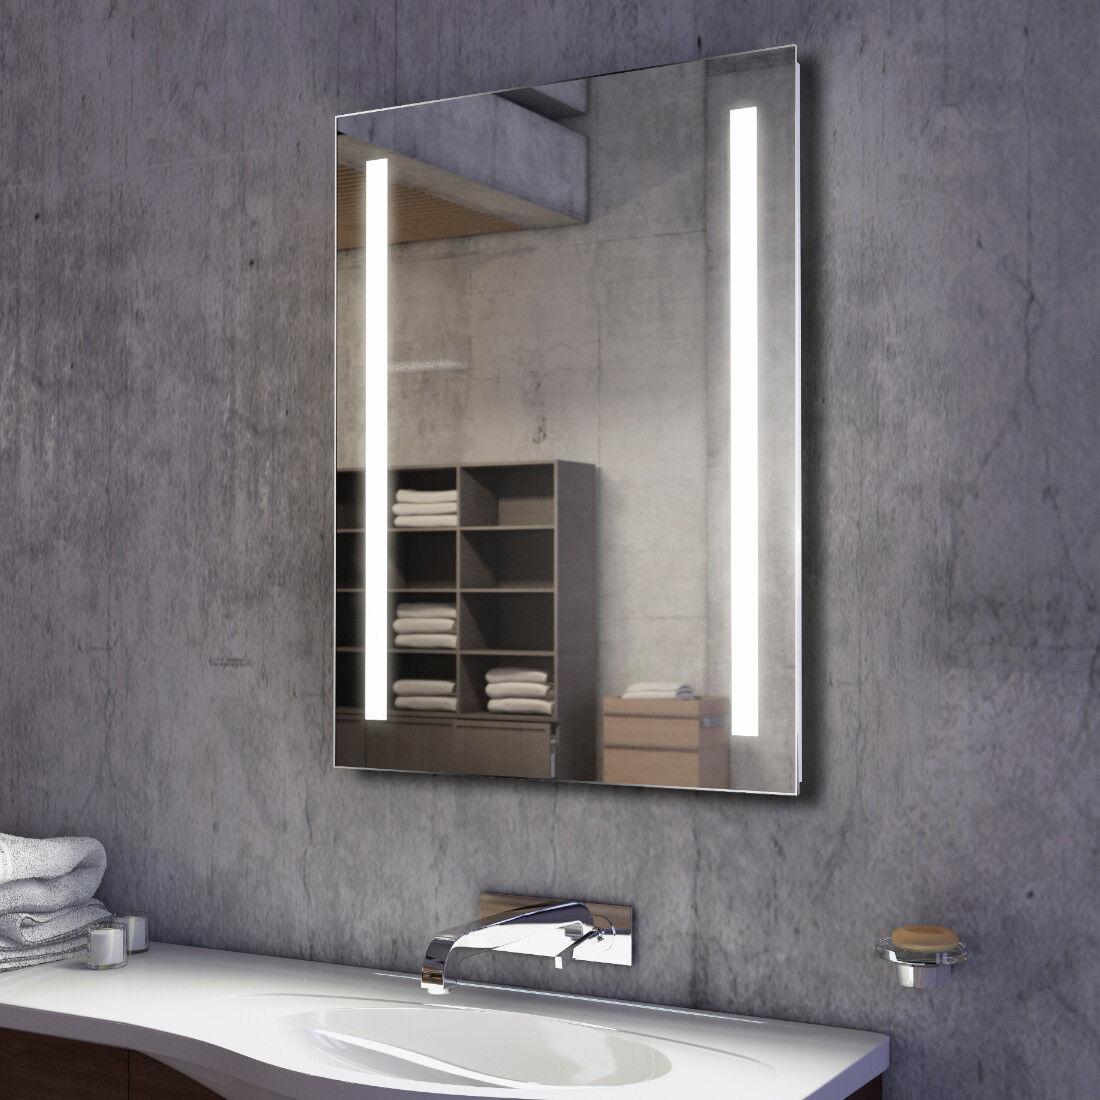 Illuminated Bathroom Bathroom Bathroom Mirror with Sensor, Demister and Shaver - Trina - c1315 781155